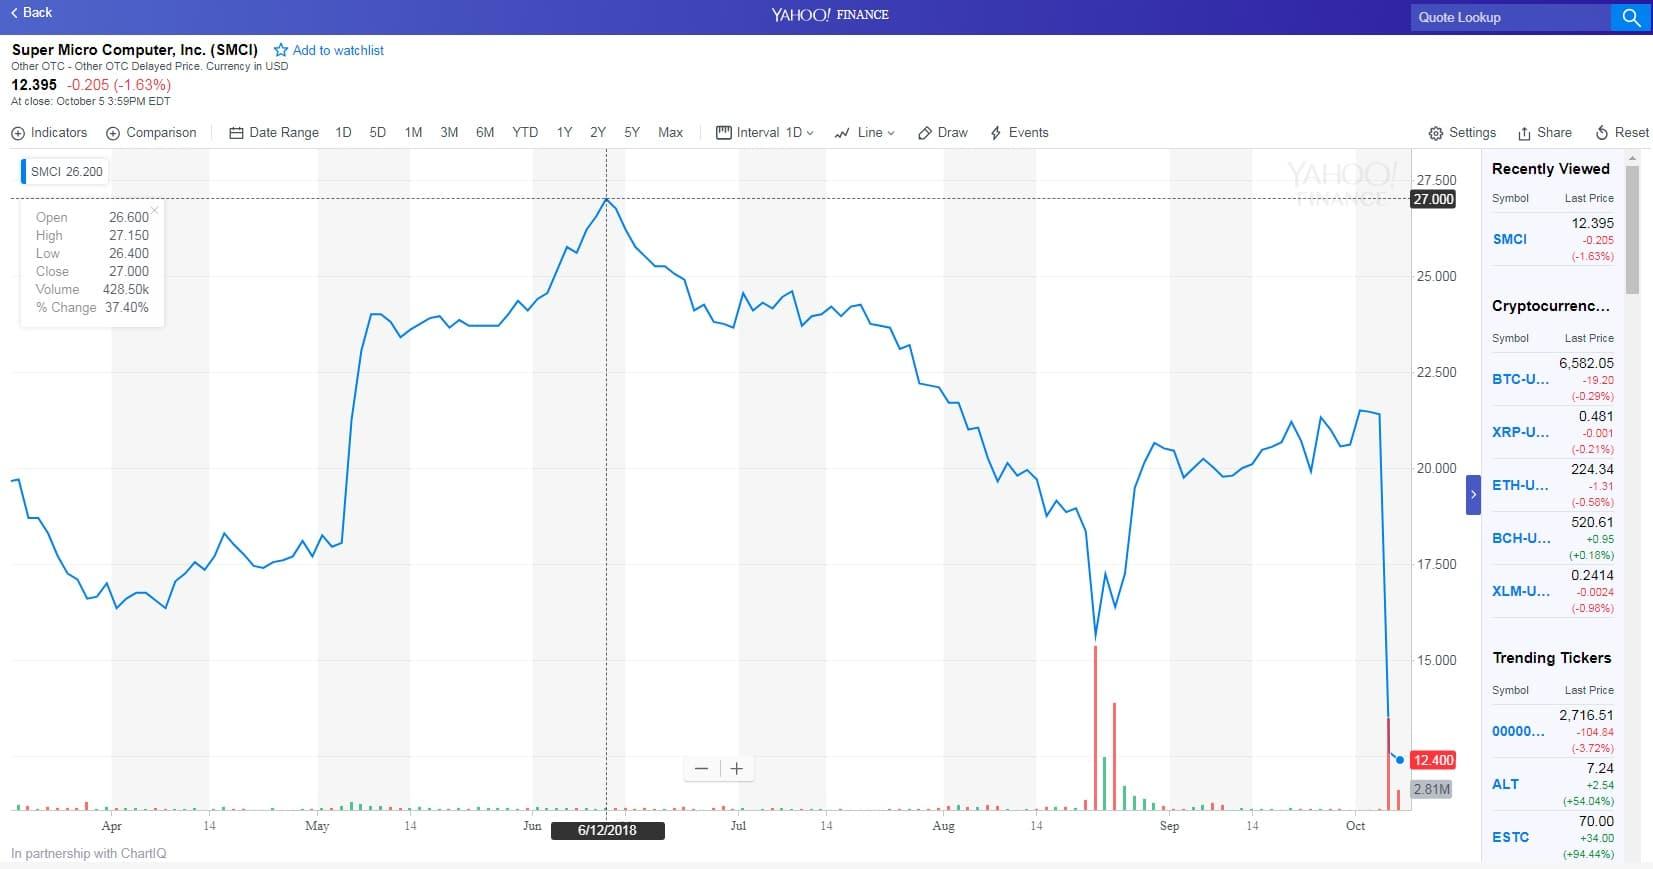 Вот так рухнул курс акций Super Micro Computer… (График от Yahoo! Finance)